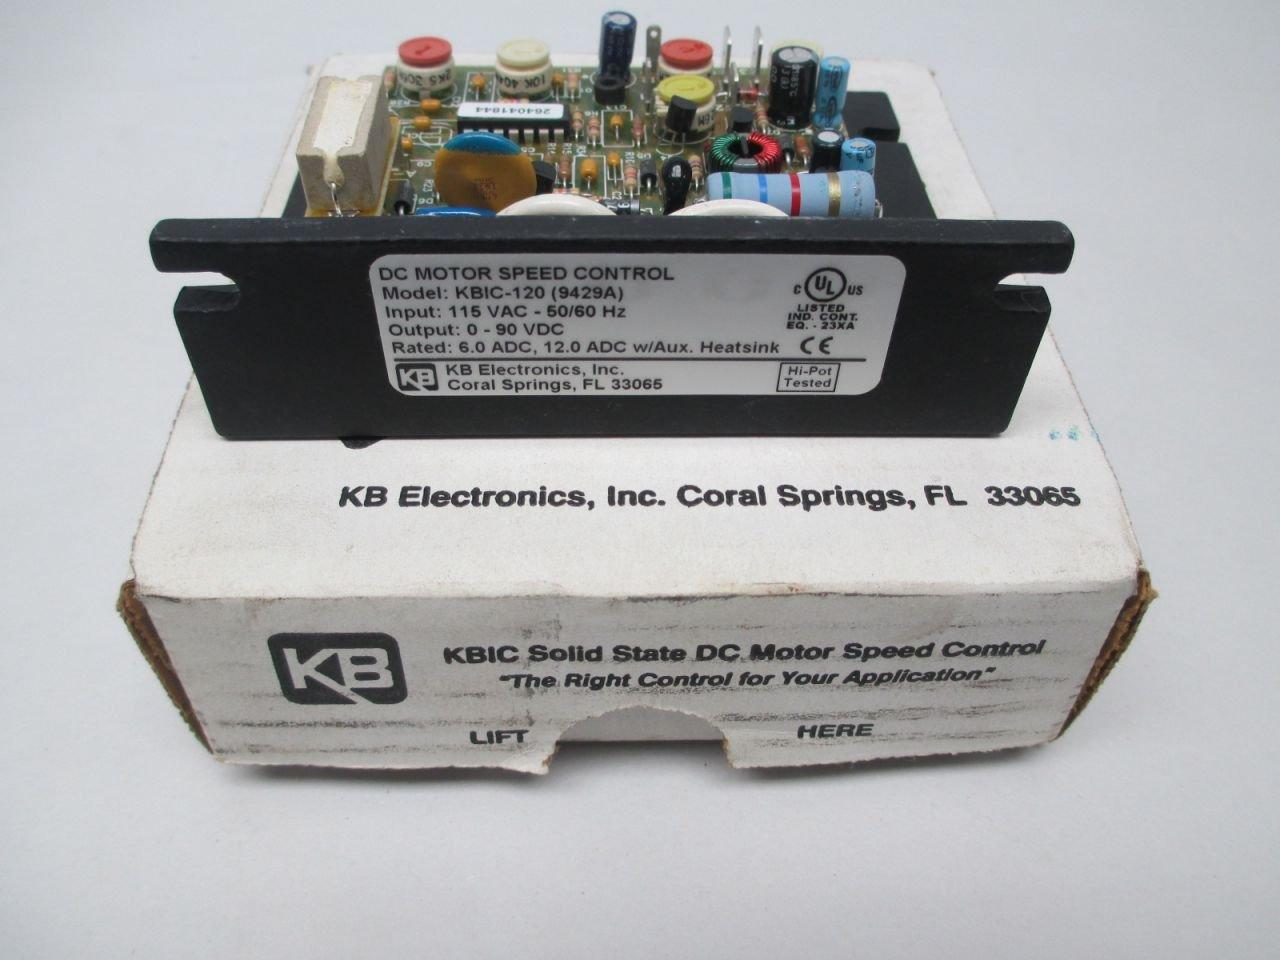 NEW KB ELECTRONICS KBIC-120 9429A 115V-AC 0-90V-DC 12A DC MOTOR ...